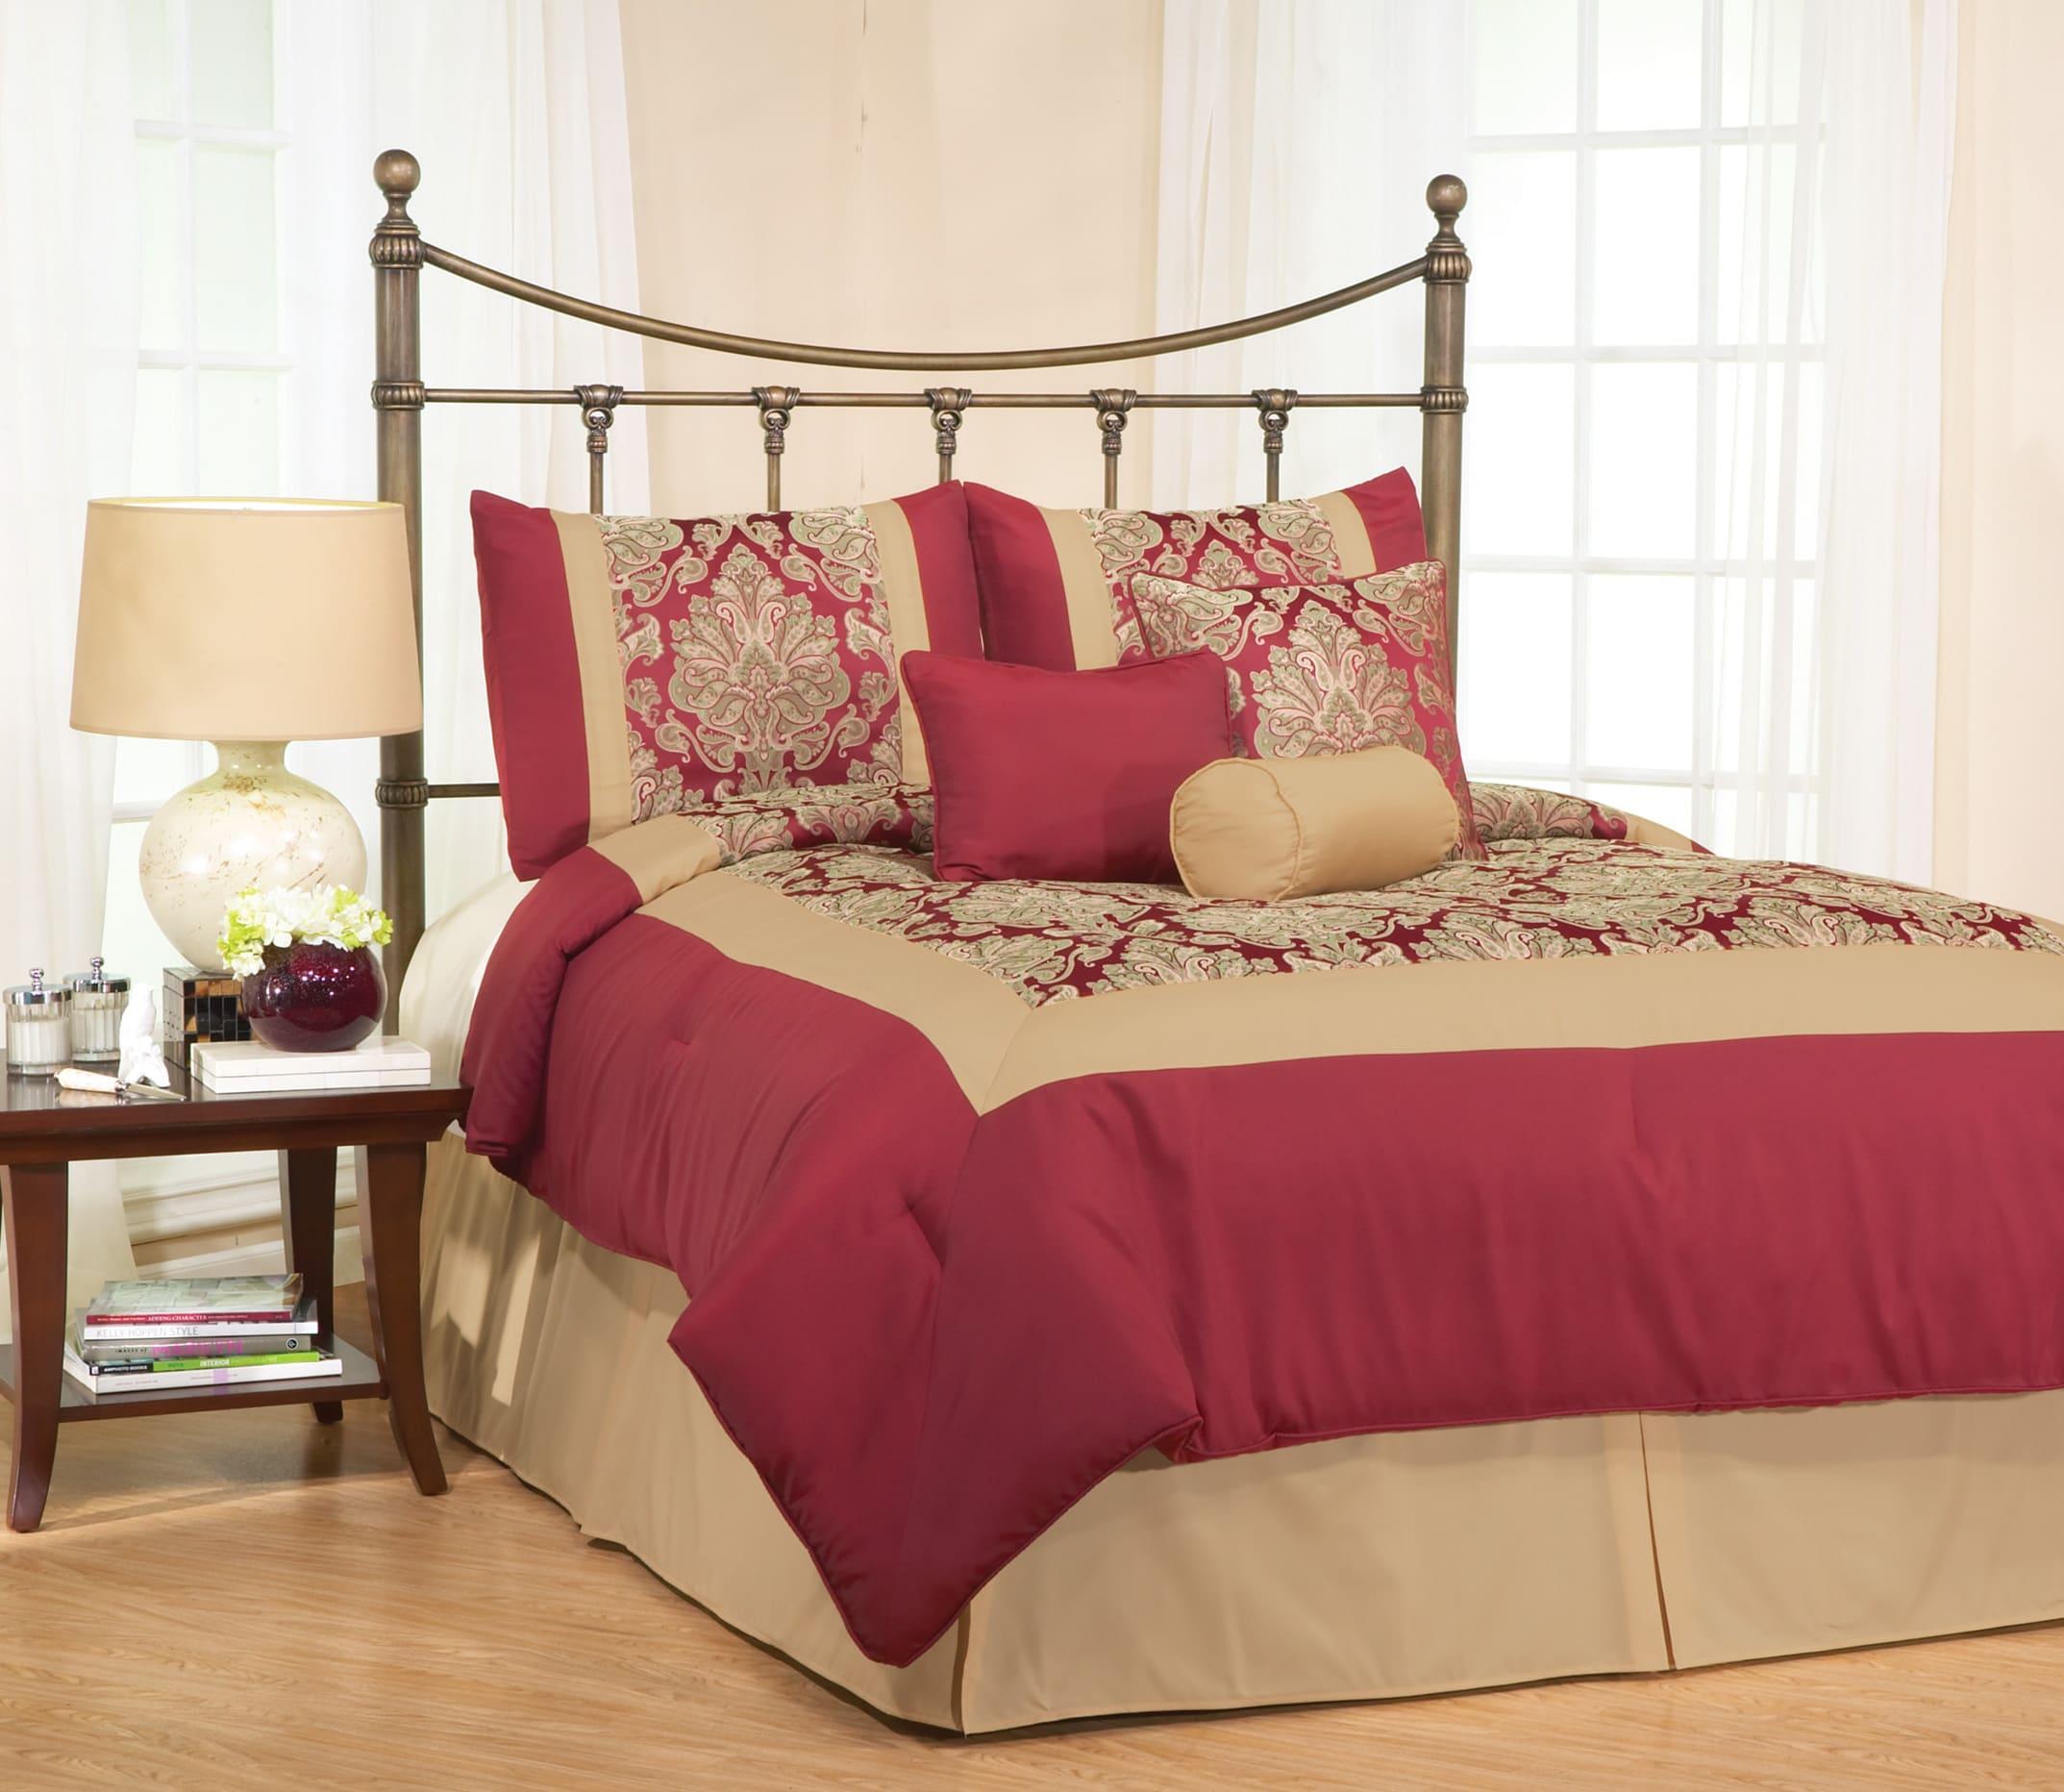 Barton 7-piece Jacquard Comforter Set - Thumbnail 1